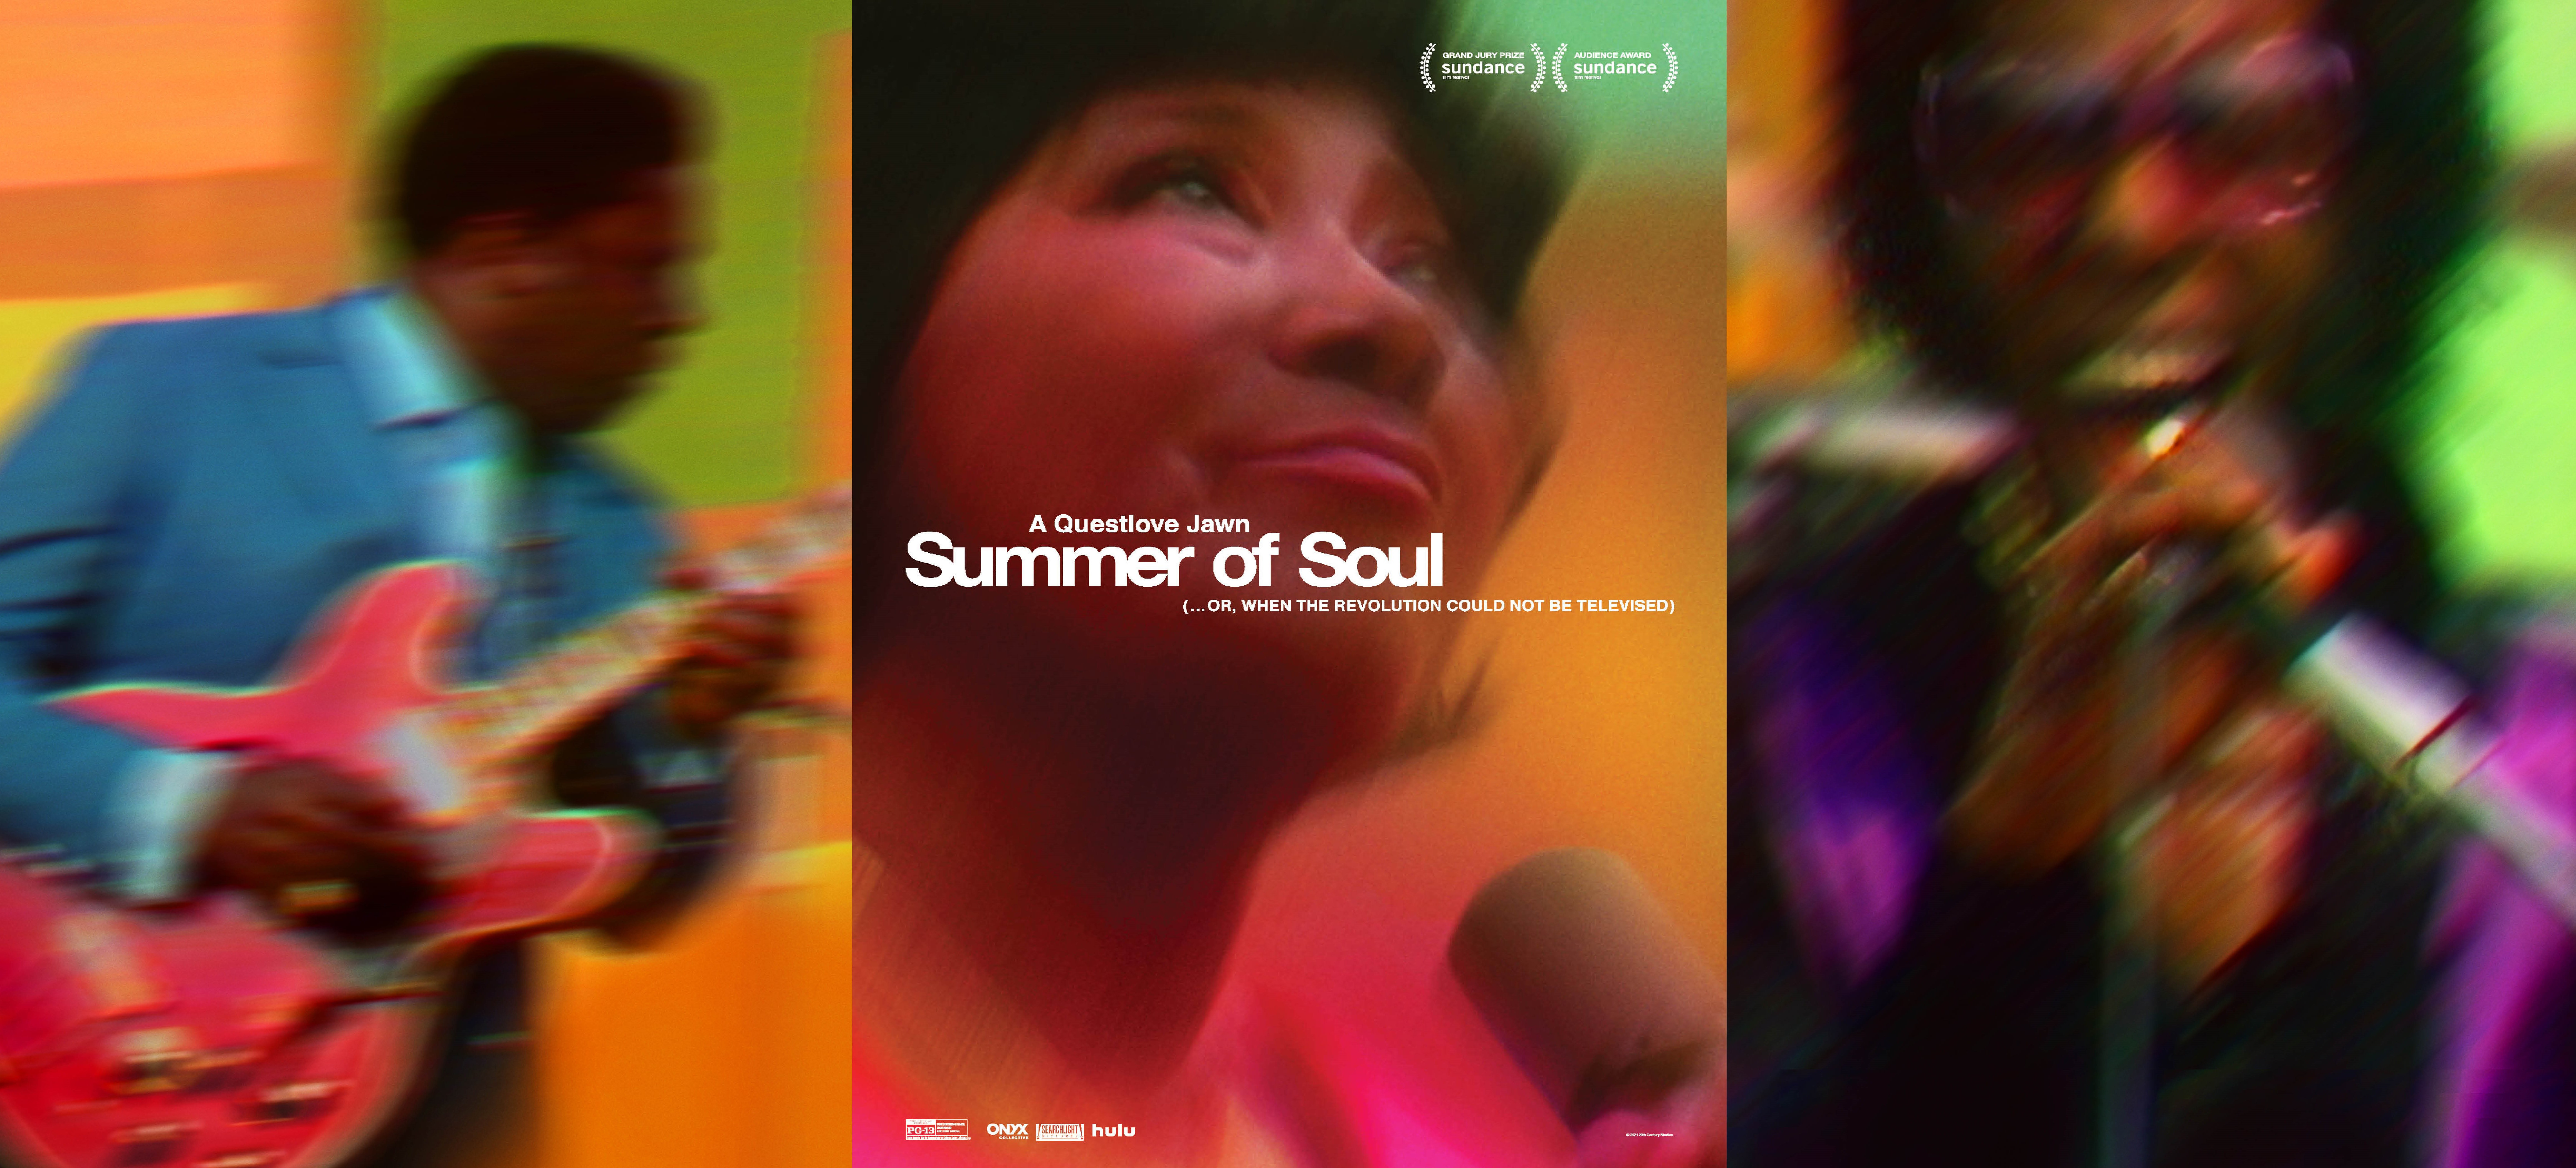 一系列三个模糊的图像:BB King 弹吉他,Mahalia Jackson 抬头,Sly & The Family Stone 唱歌。